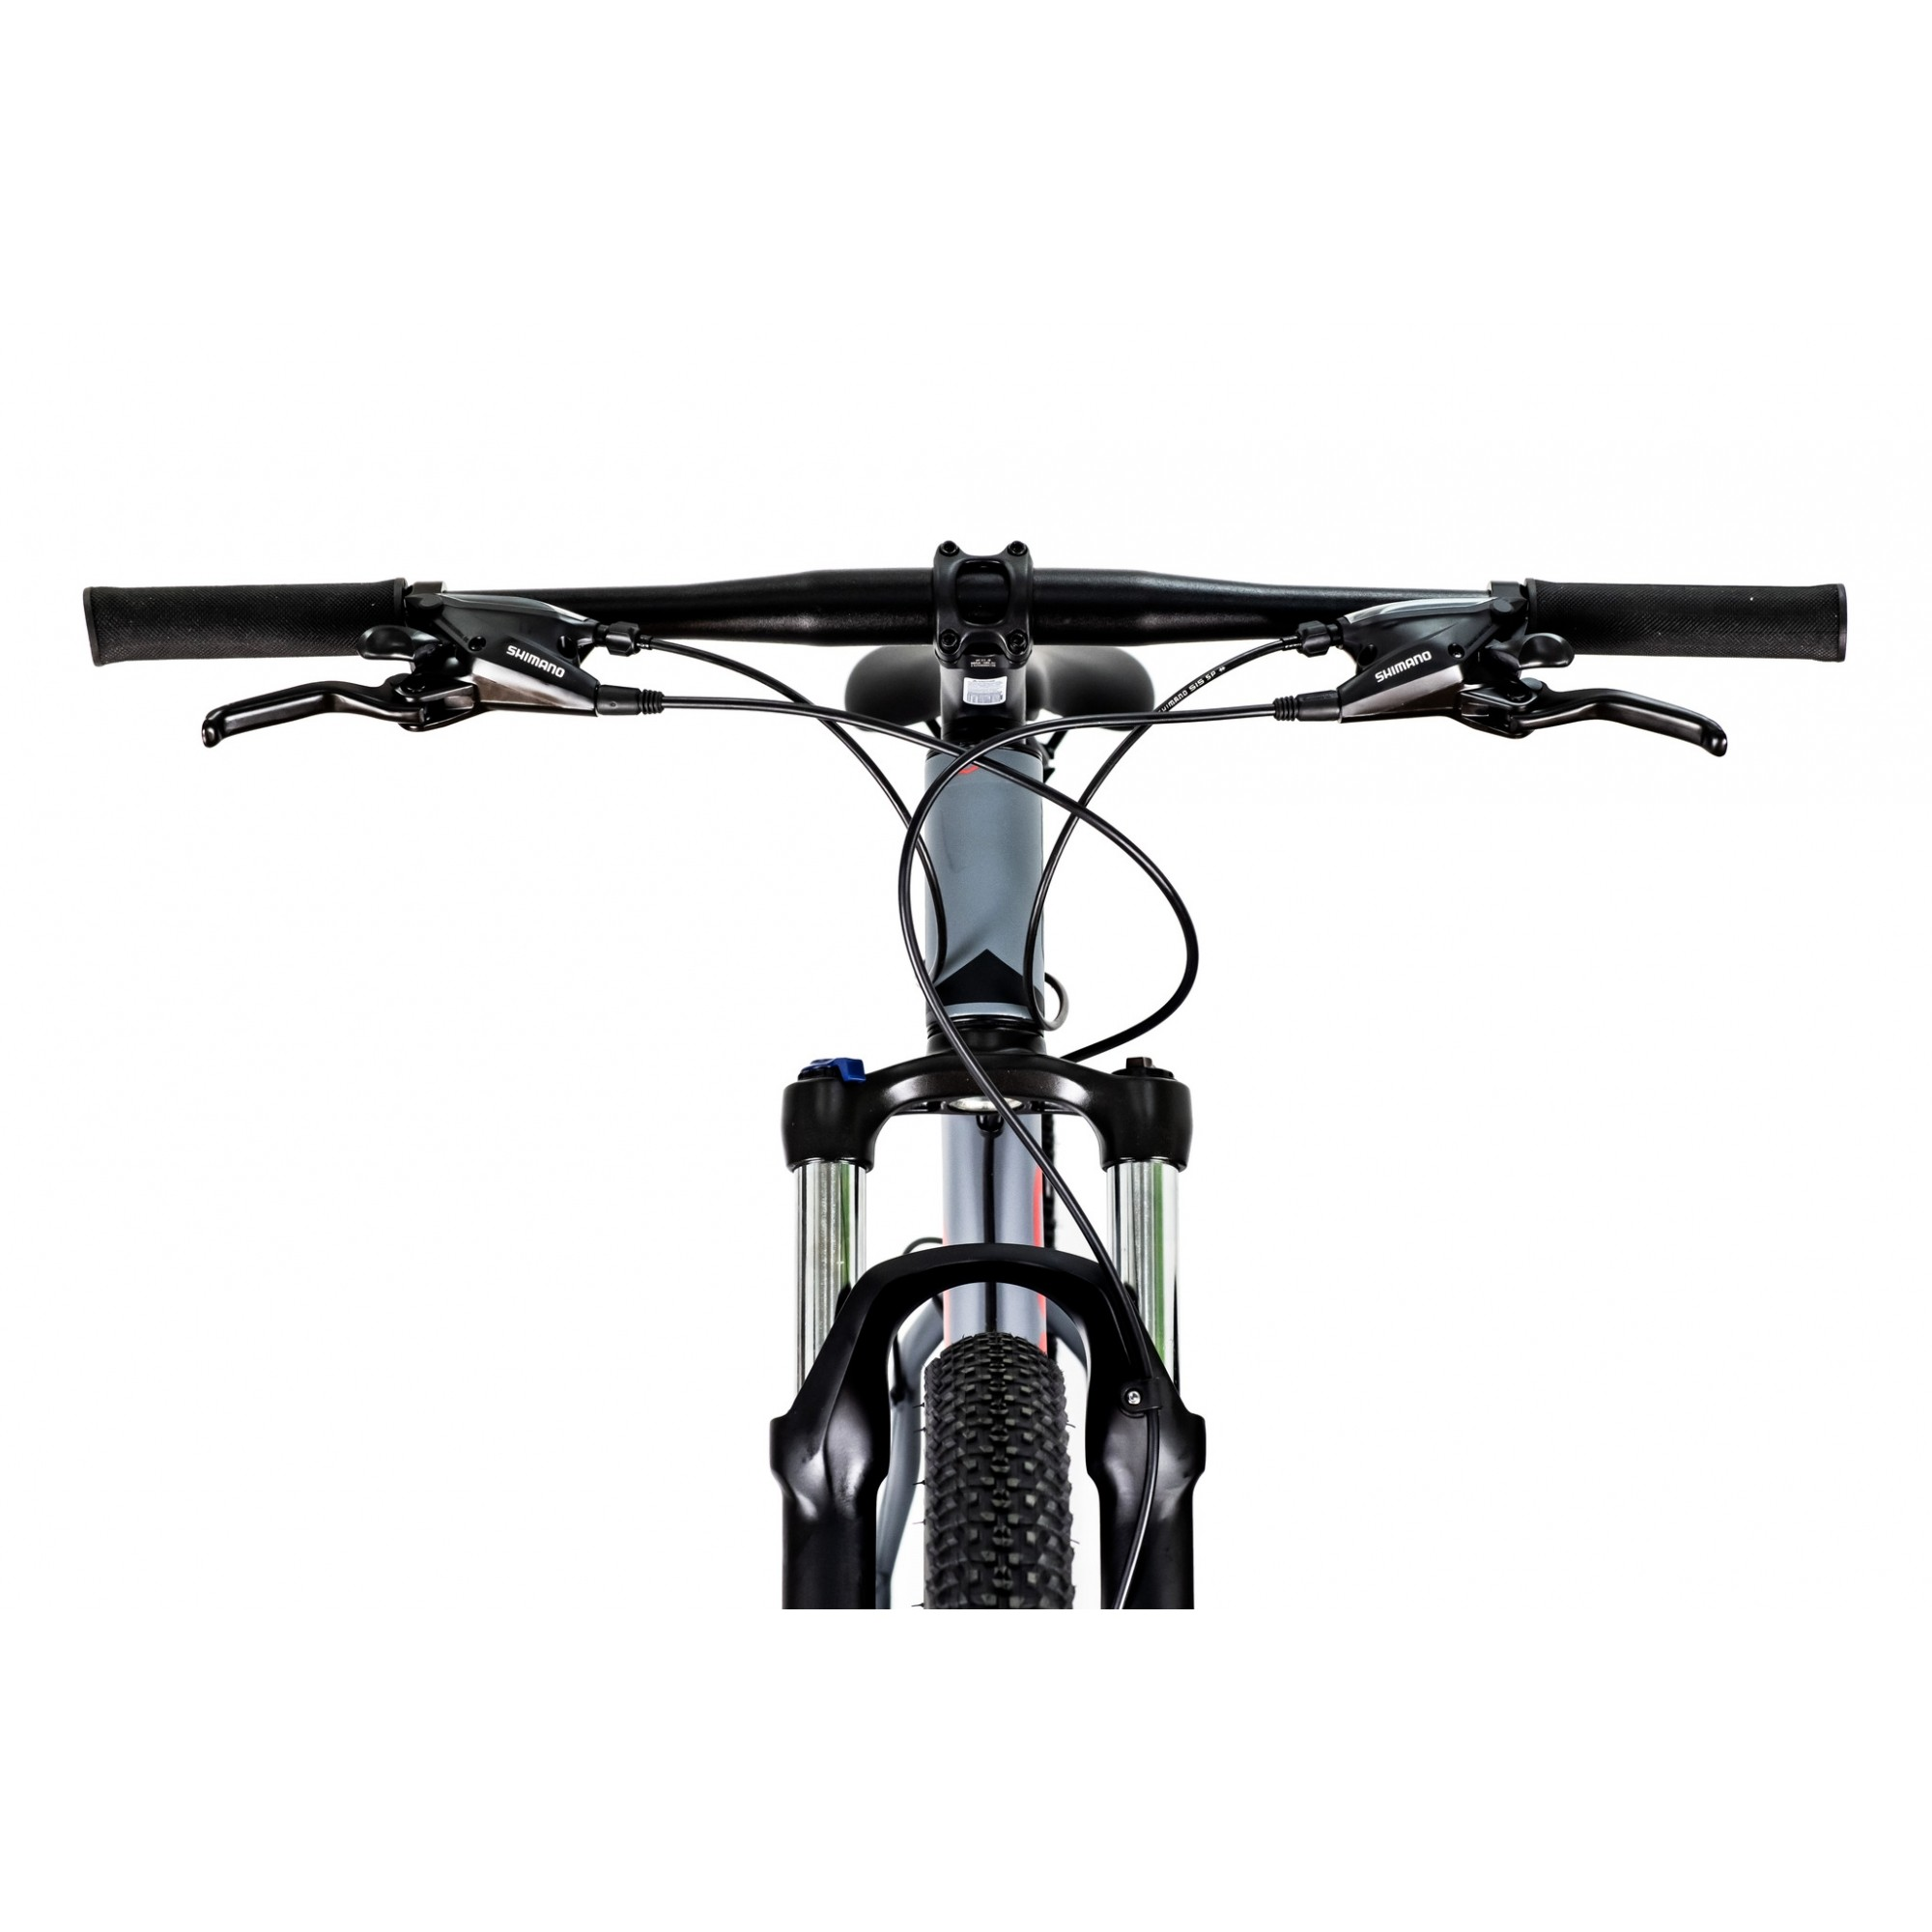 Bicicleta OGGI Hacker HDS 2021 - 24v Shimano Tourney - Freio Shimano Hidráulico - Cinza/Vermelho + BRINDES